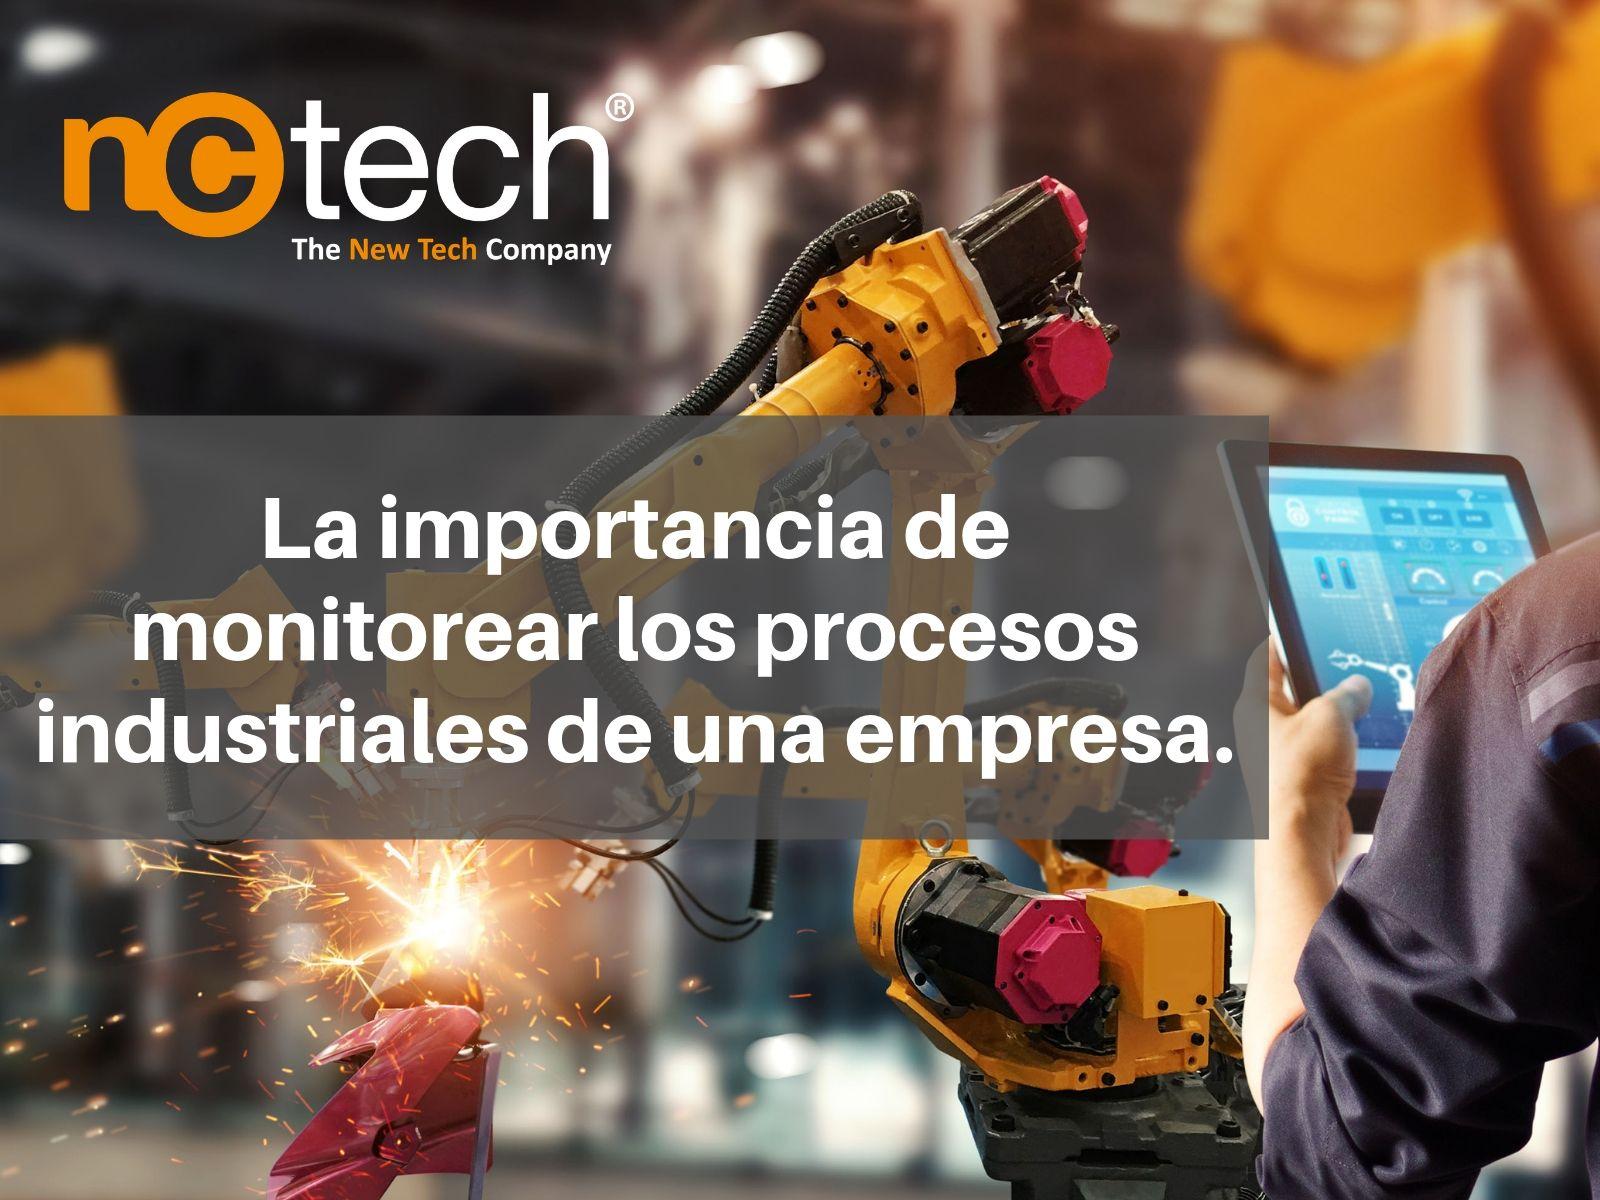 https://nctech.com.mx/wp-content/uploads/2019/07/¿Cómo-comenzar-a-implementar-estrategias-de-Industria-4.0_-5.jpg